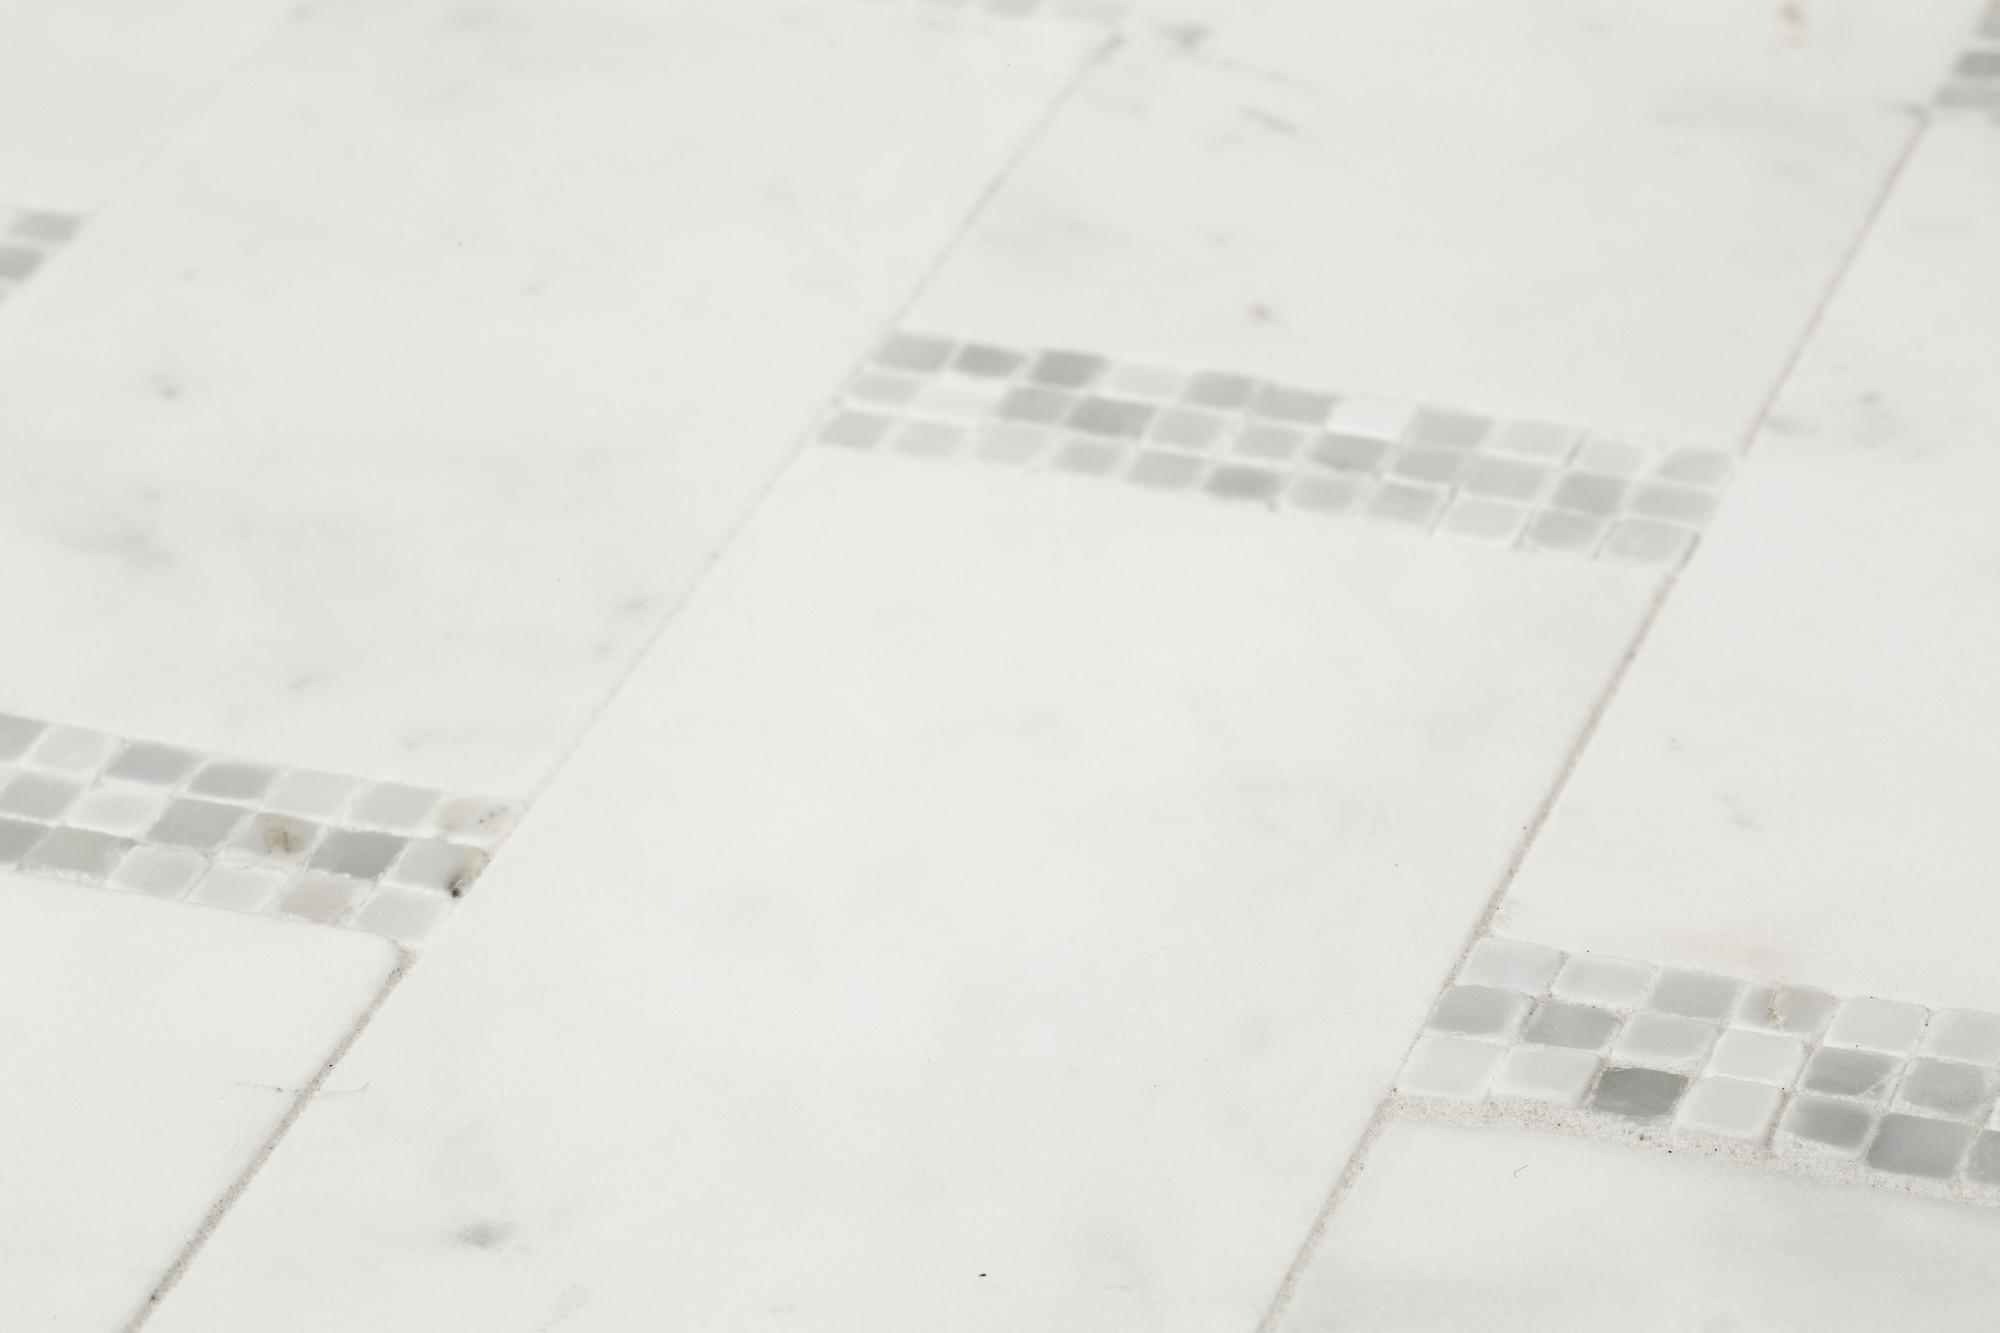 Nice 12X12 Ceiling Tiles Tall 12X12 Tin Ceiling Tiles Shaped 20 X 20 Ceramic Tile Accent Tiles For Kitchen Backsplash Youthful Anti Slip Ceramic Tiles ColouredArizona Tile Flooring Jeffrey Court* Subway Mosaic   Grey   SALE   Tile Stone Source